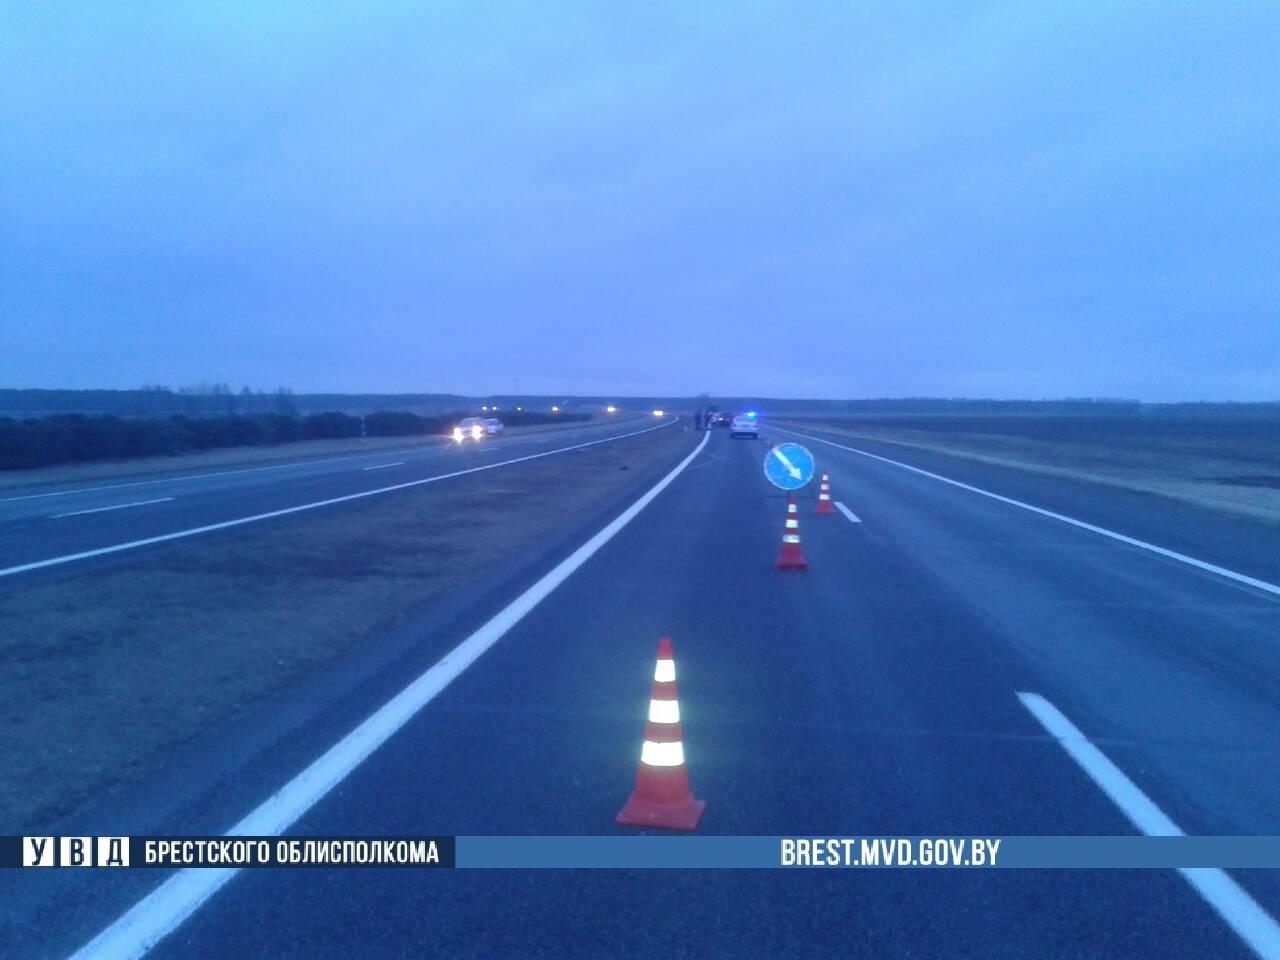 В Березовском районе на трассе М-1 погиб пешеход: шёл по дороге